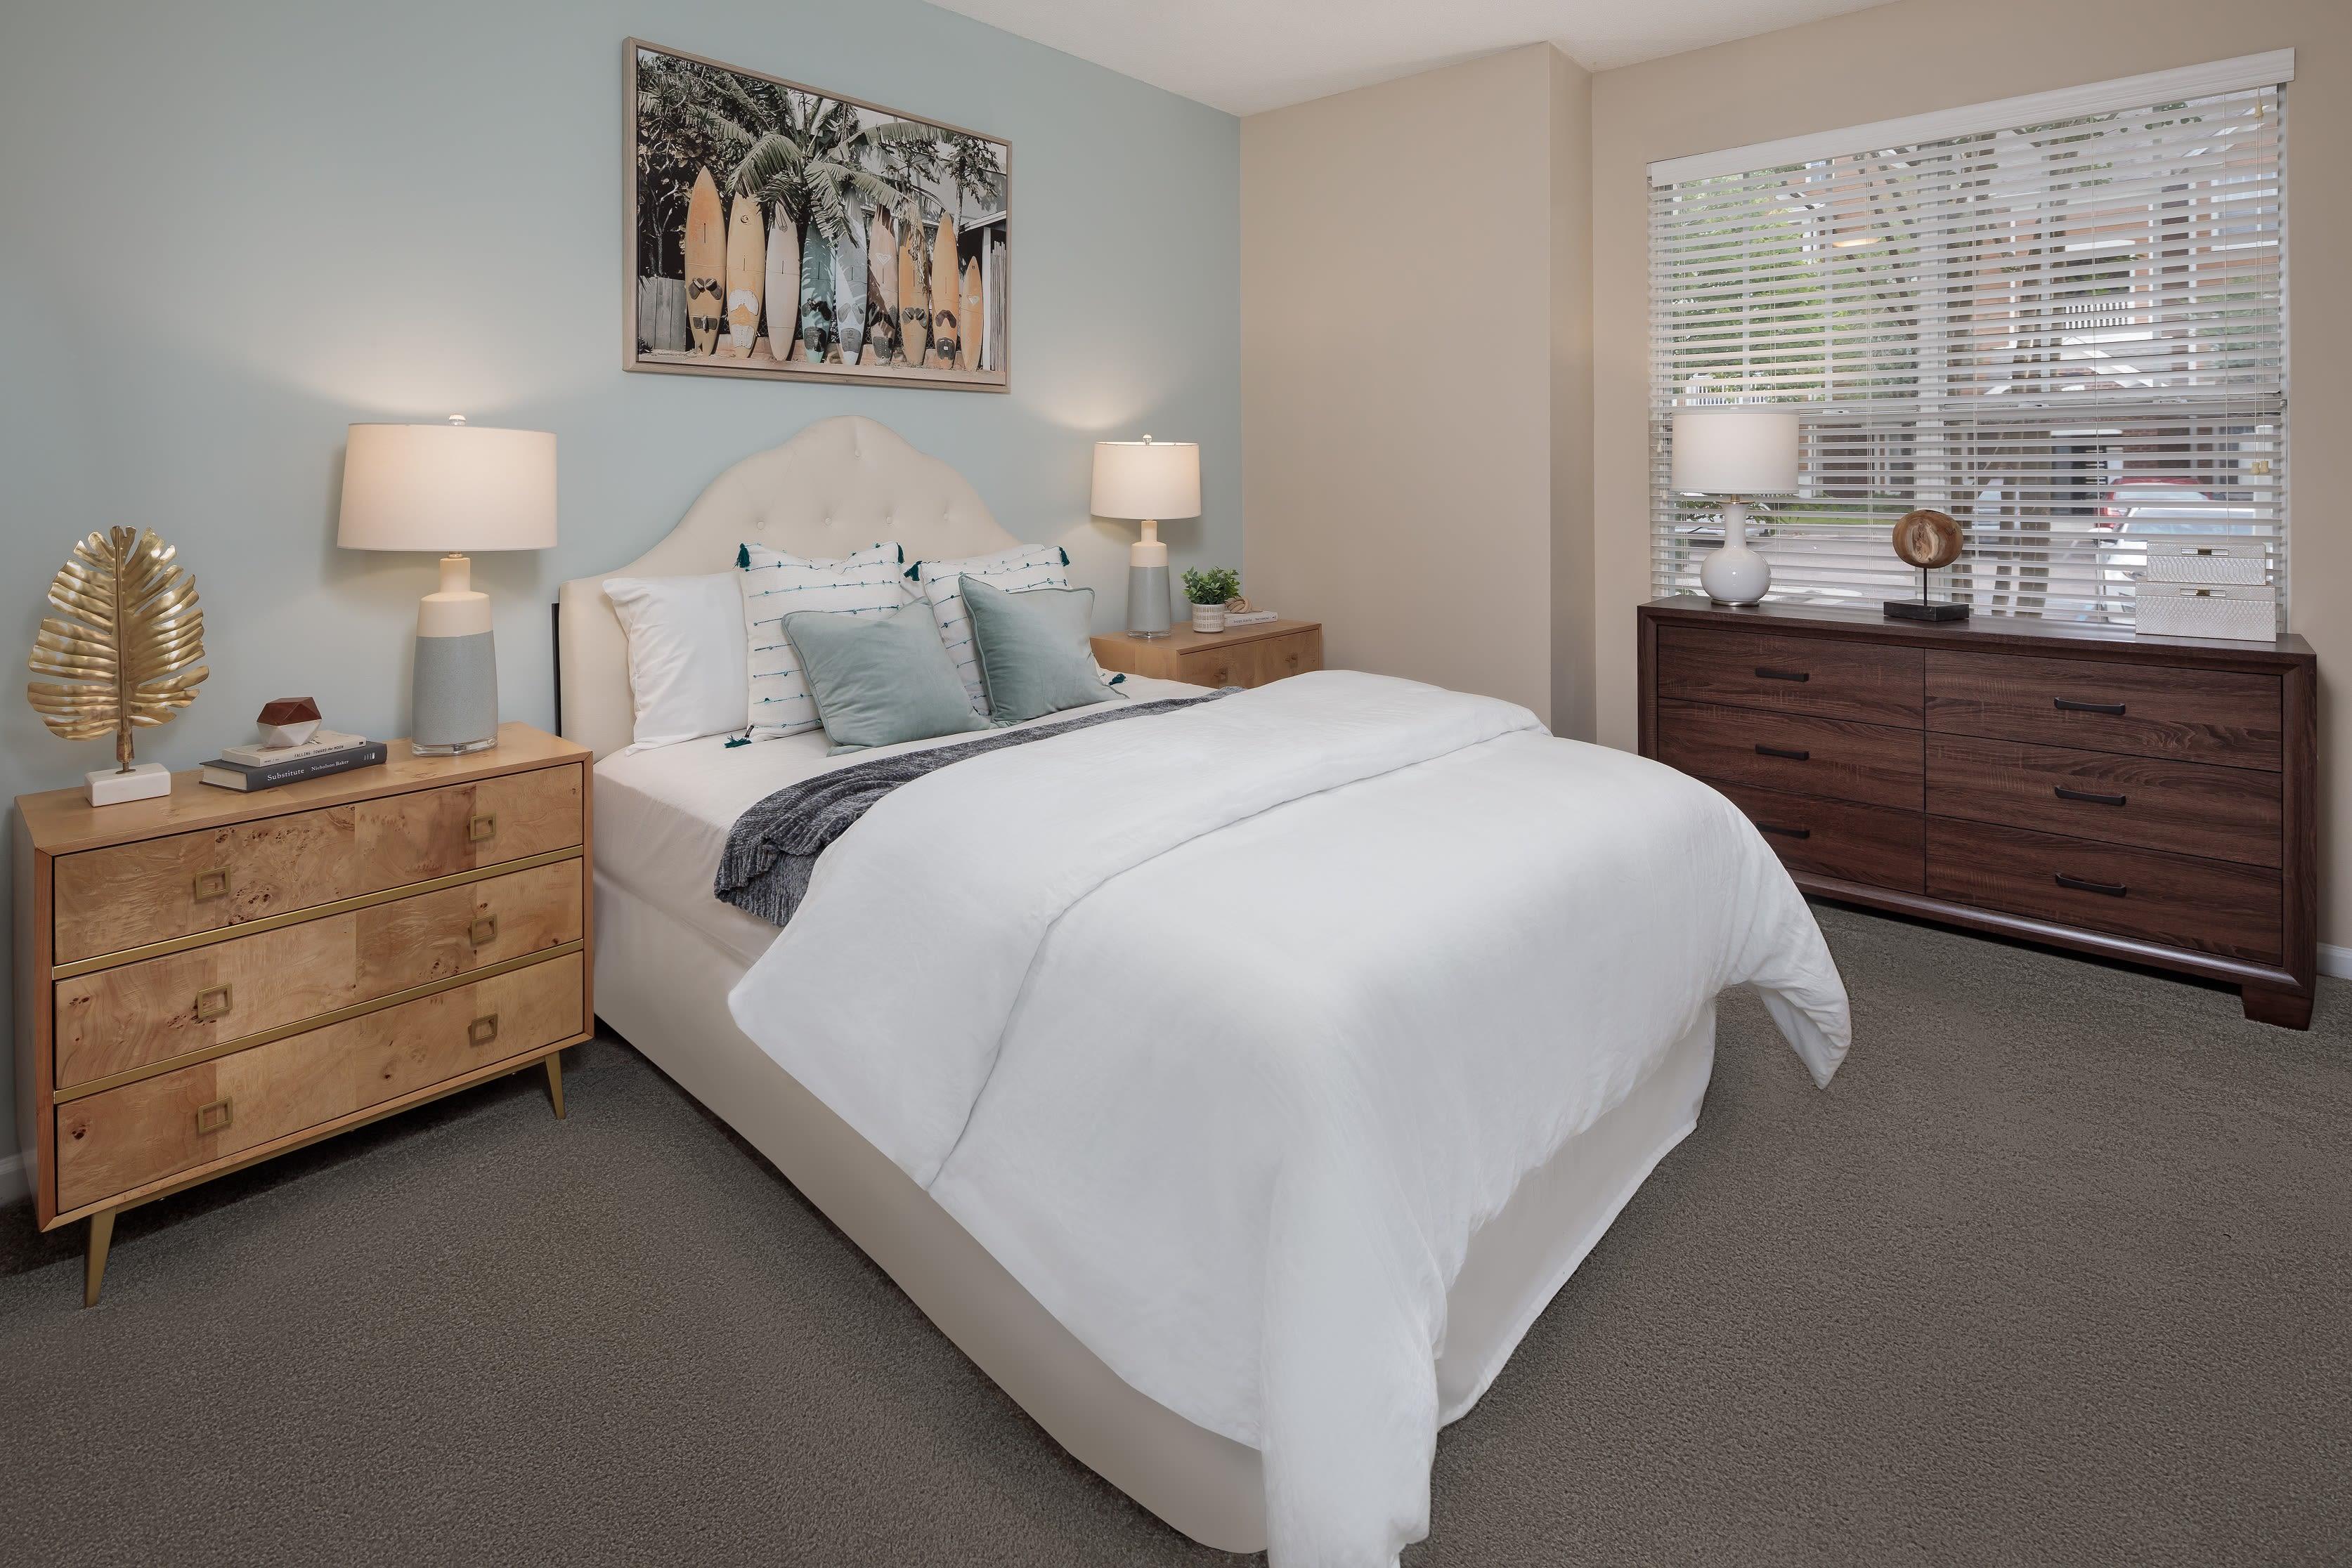 A furnished bedroom at Bryant at Summerville at Bryant at Summerville in Summerville, South Carolina